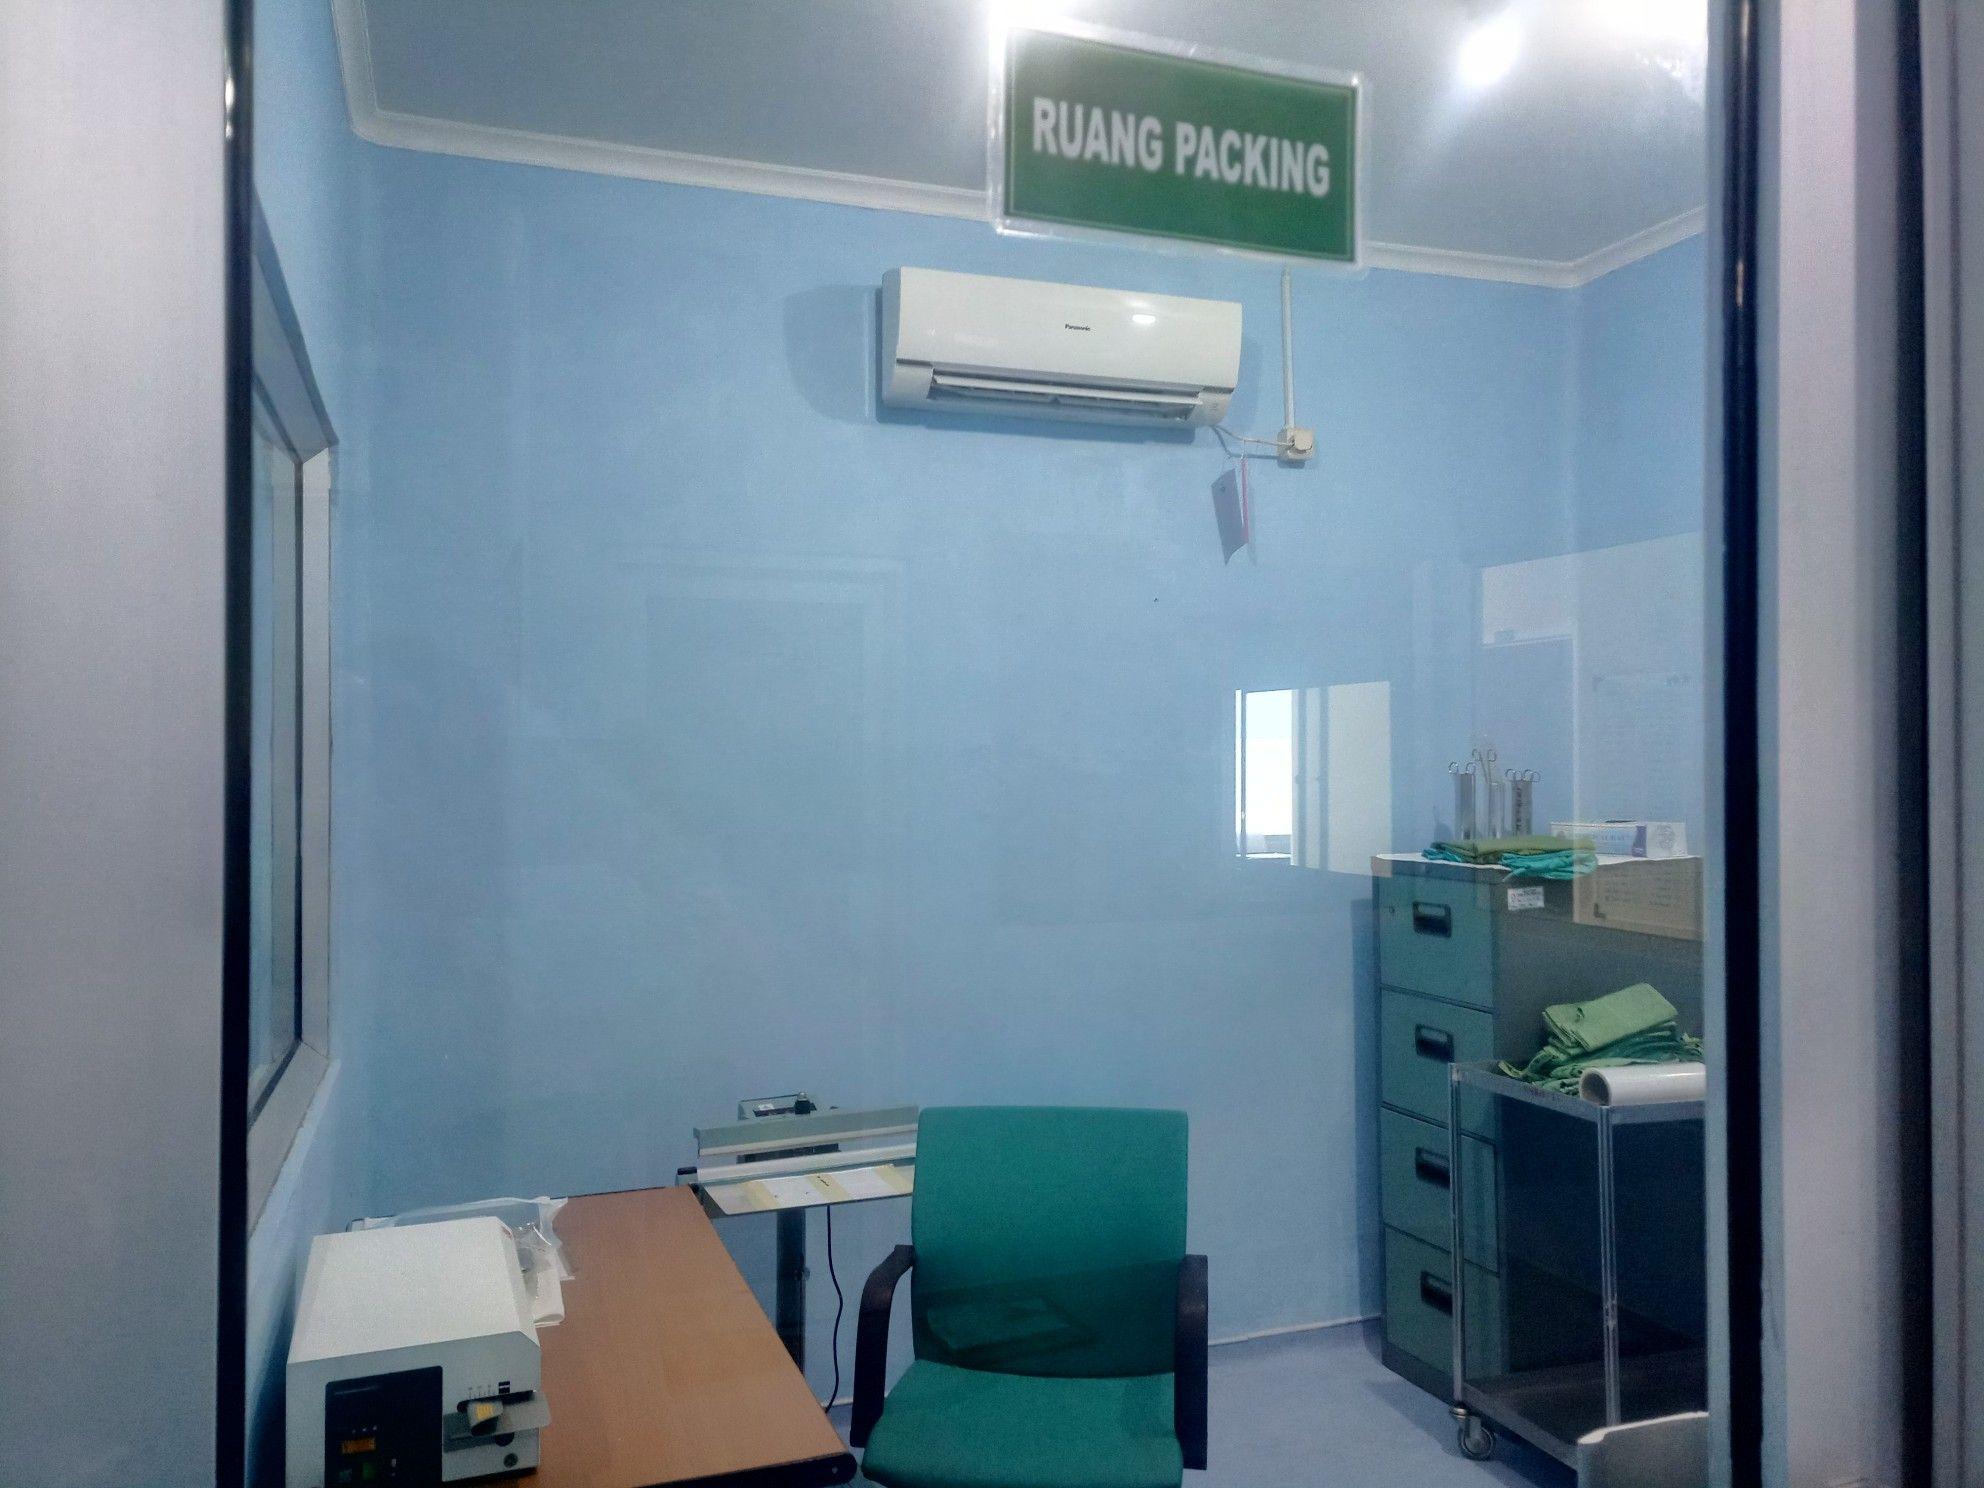 Deskripsi : ruang packing CSSD RSKO Jakarta I Sumber Foto : dokpri RSKO